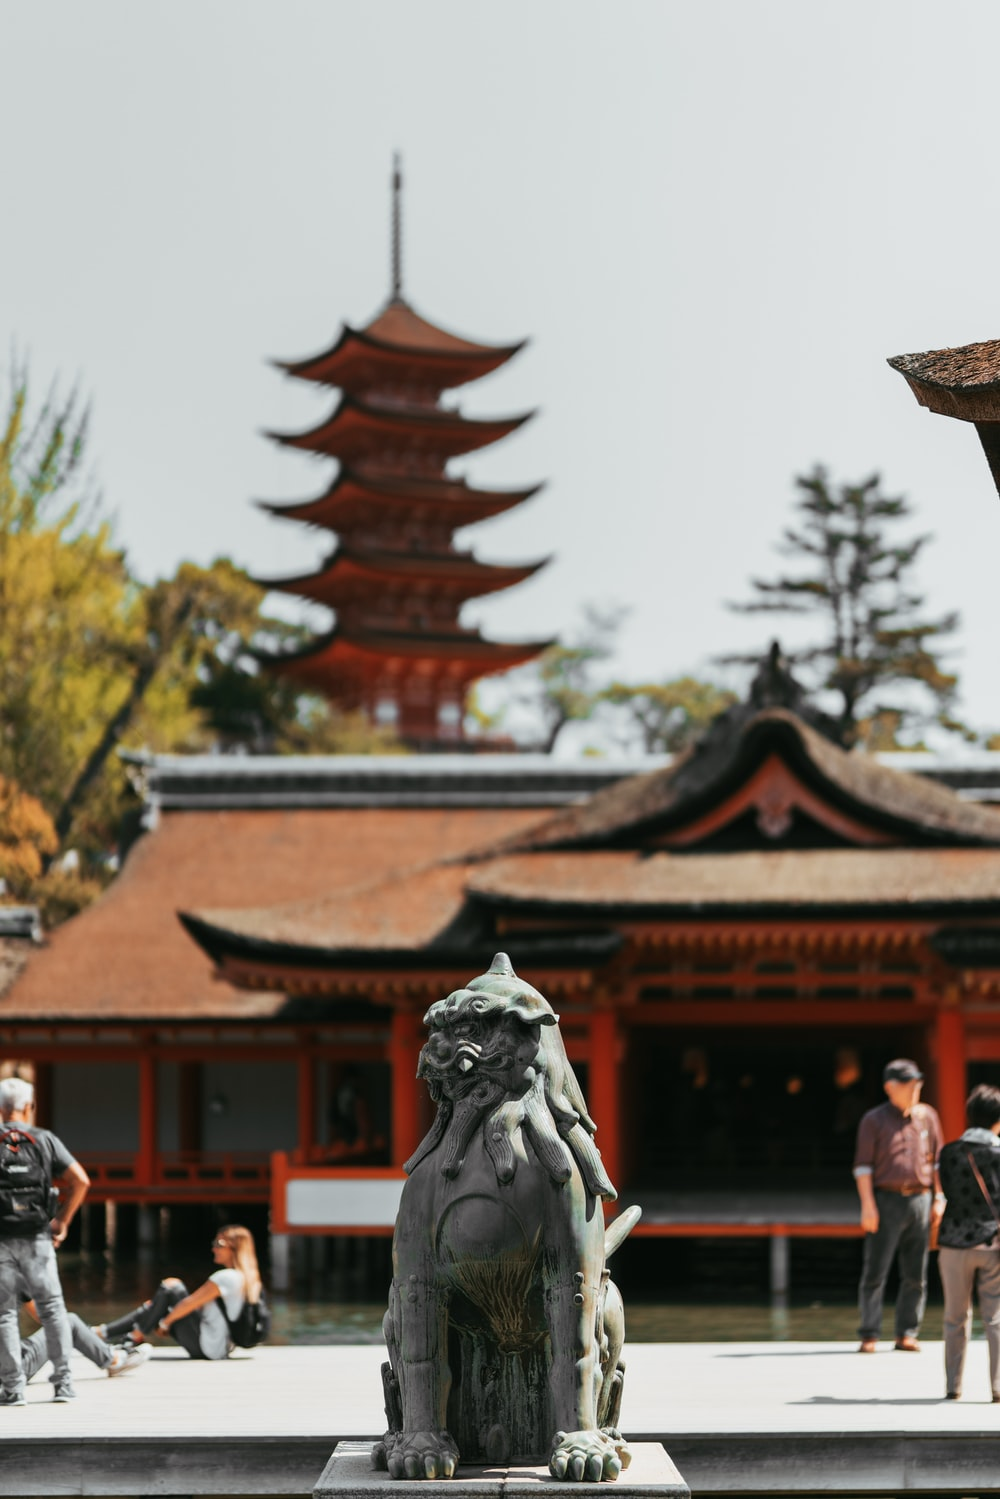 black wolf figurine near pagoda house